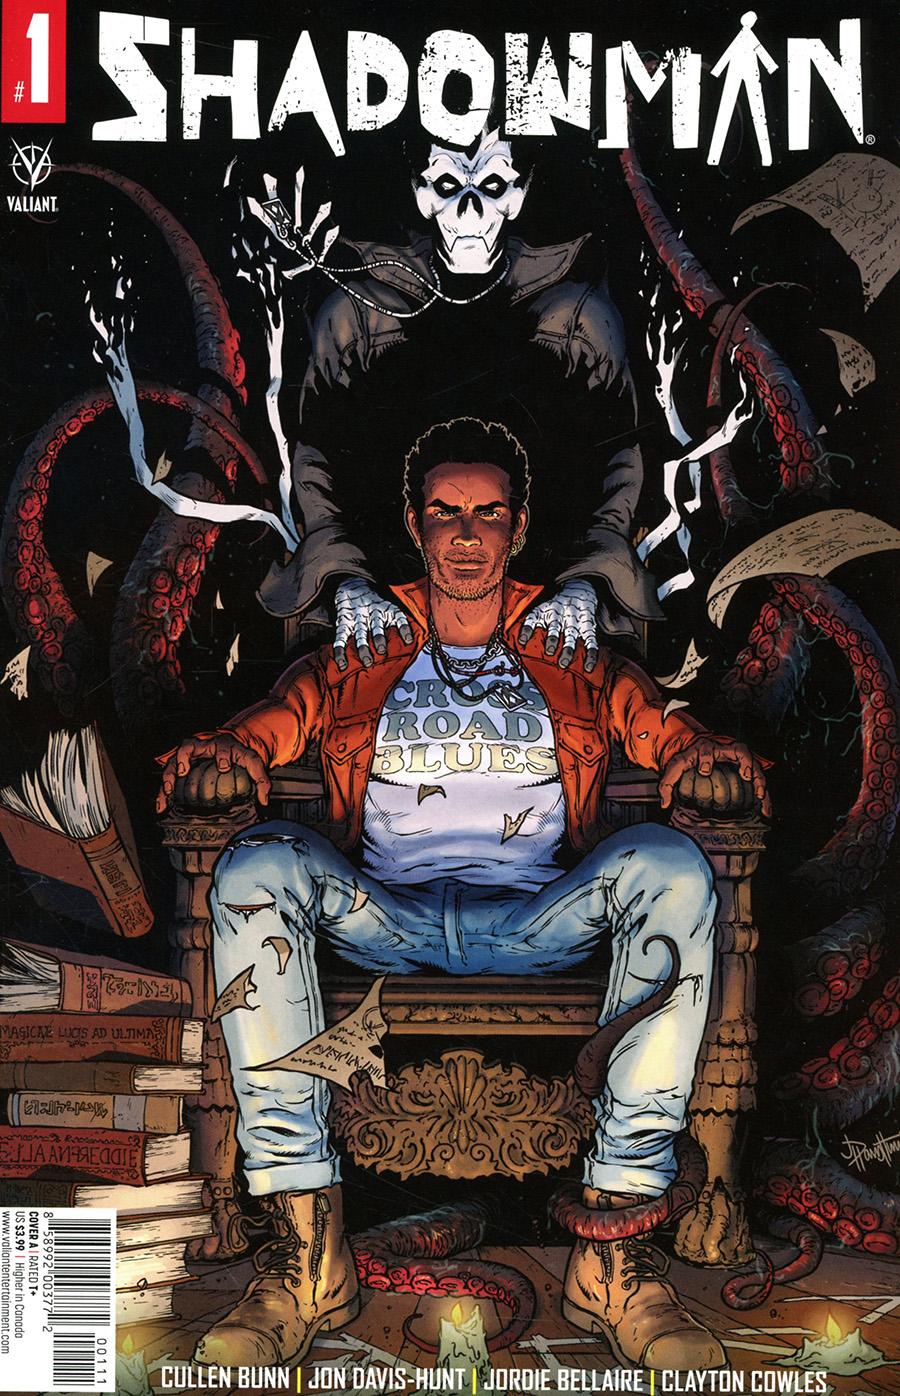 Shadowman Vol 6 #1 Cover A Regular Jon Davis-Hunt Cover - RESOLICITED